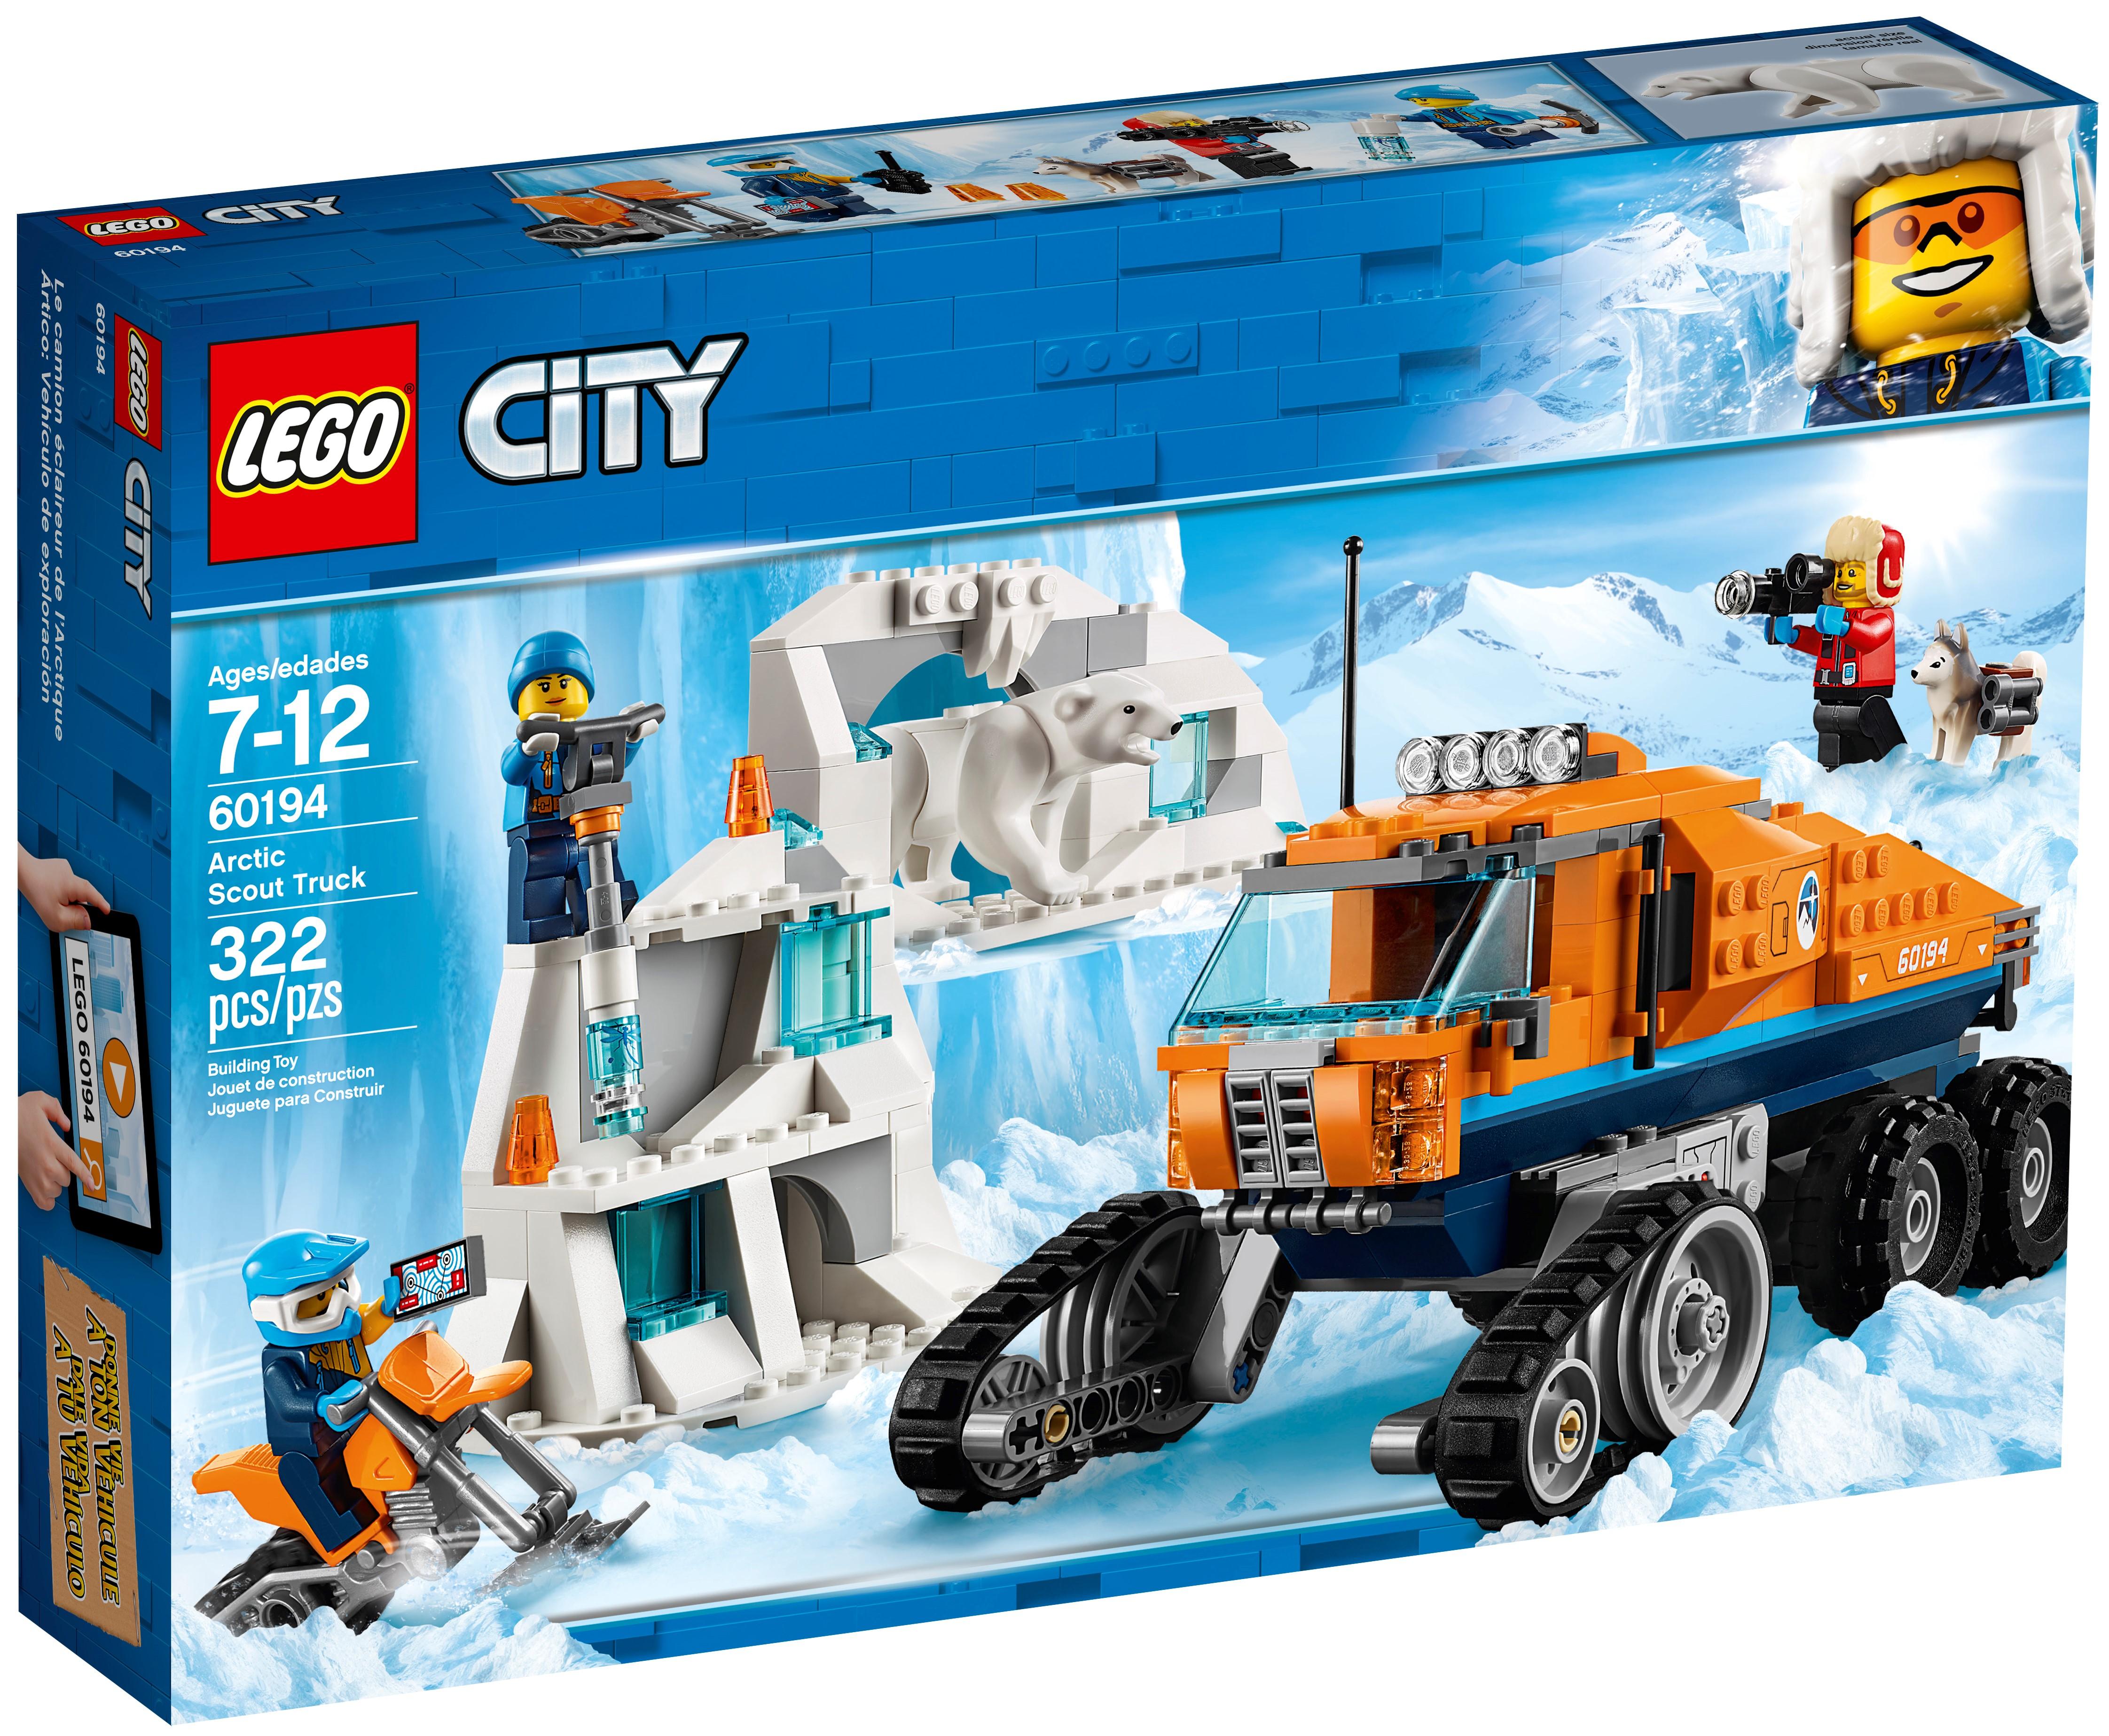 Lego City Town Arctic Scout Truck 60194 NEW Building Set Polar Bear Snowmobile